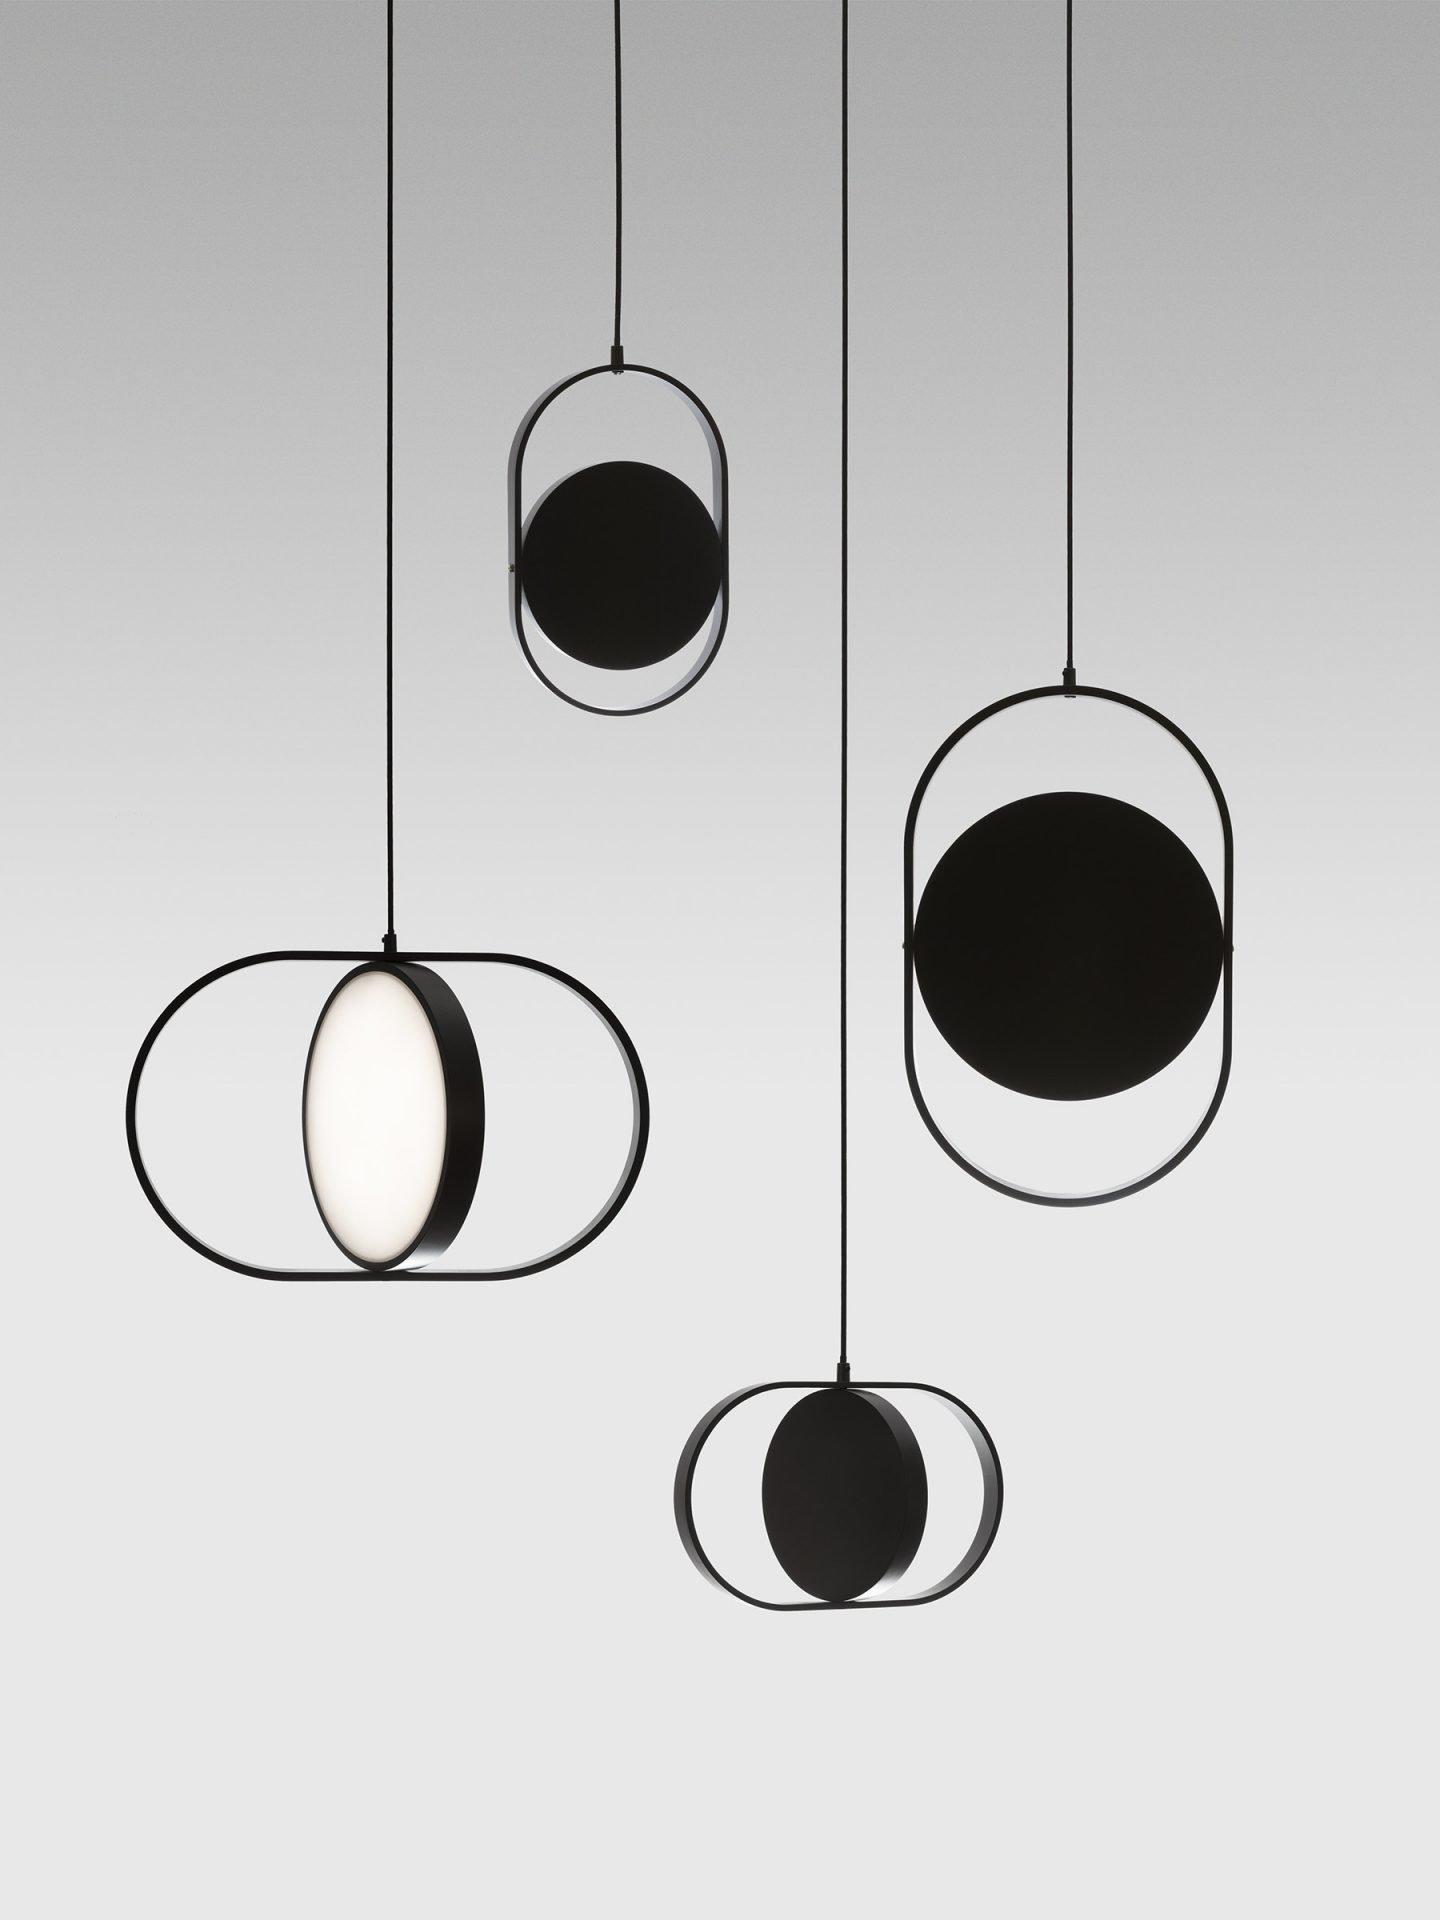 iGNANT-Design-Elina-Ulvio-KUU-04